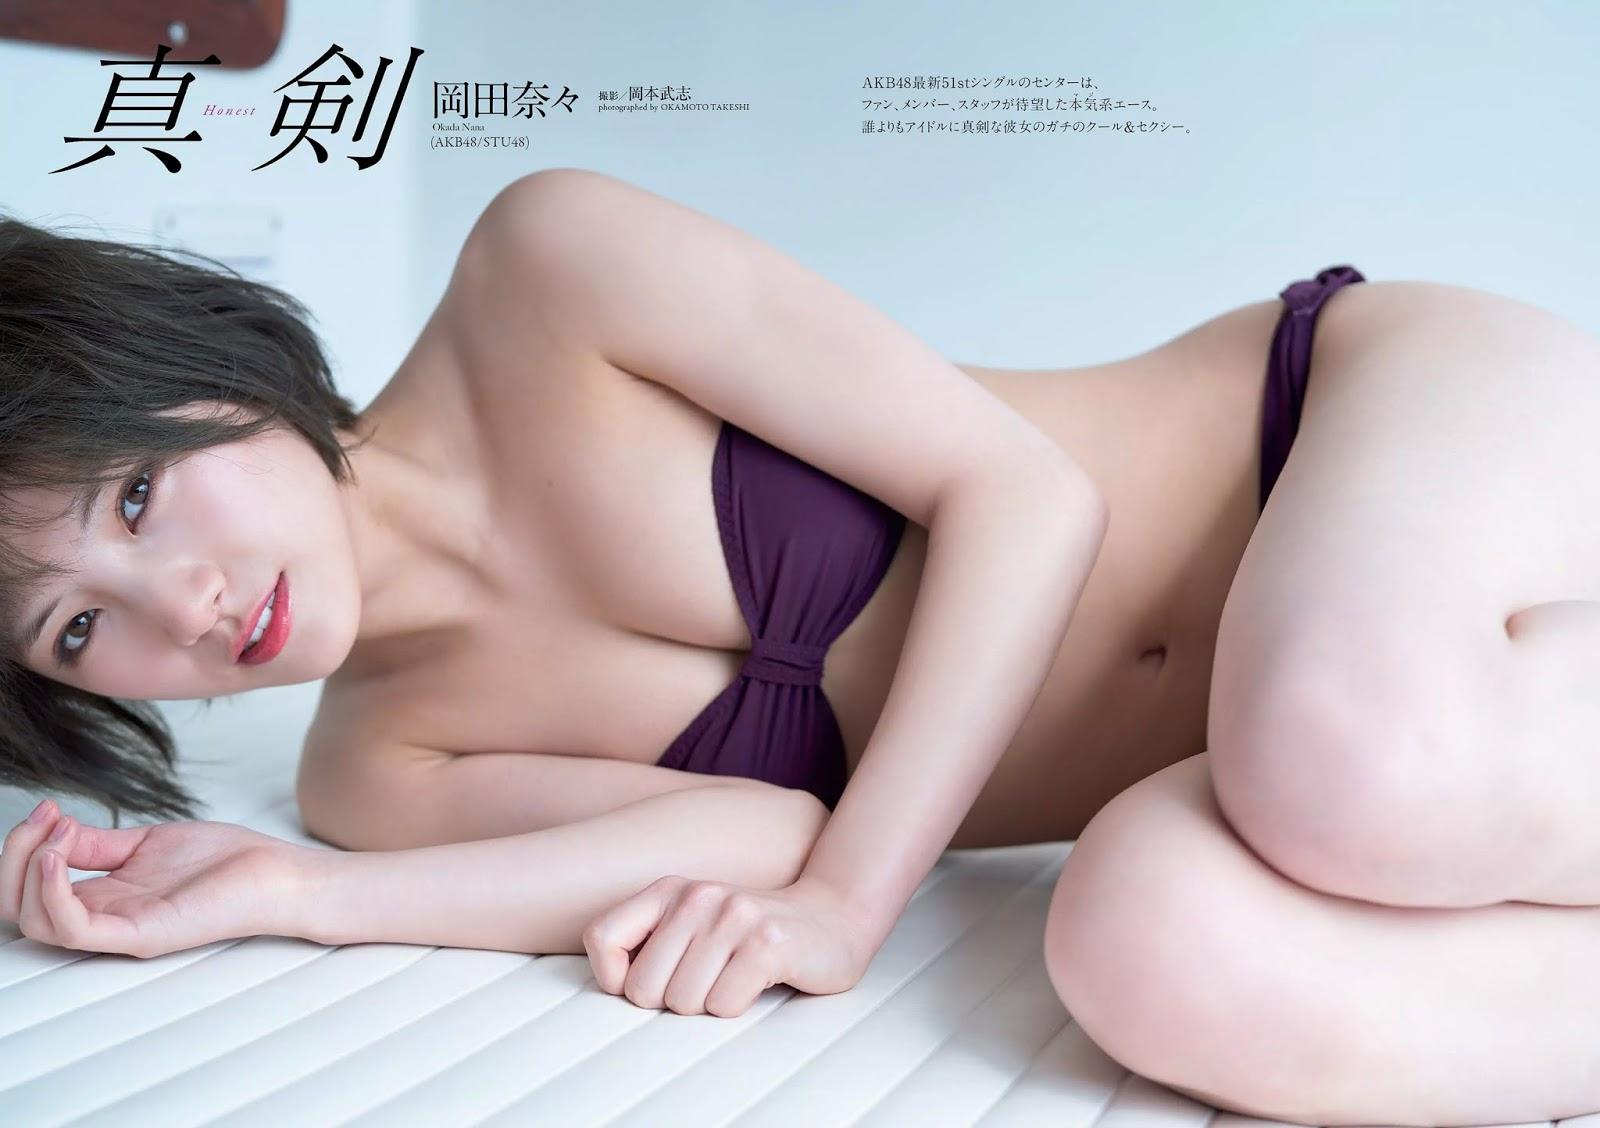 Okada Nana 岡田奈々, Weekly Playboy 2018 No.13 (週刊プレイボーイ 2018年13号)